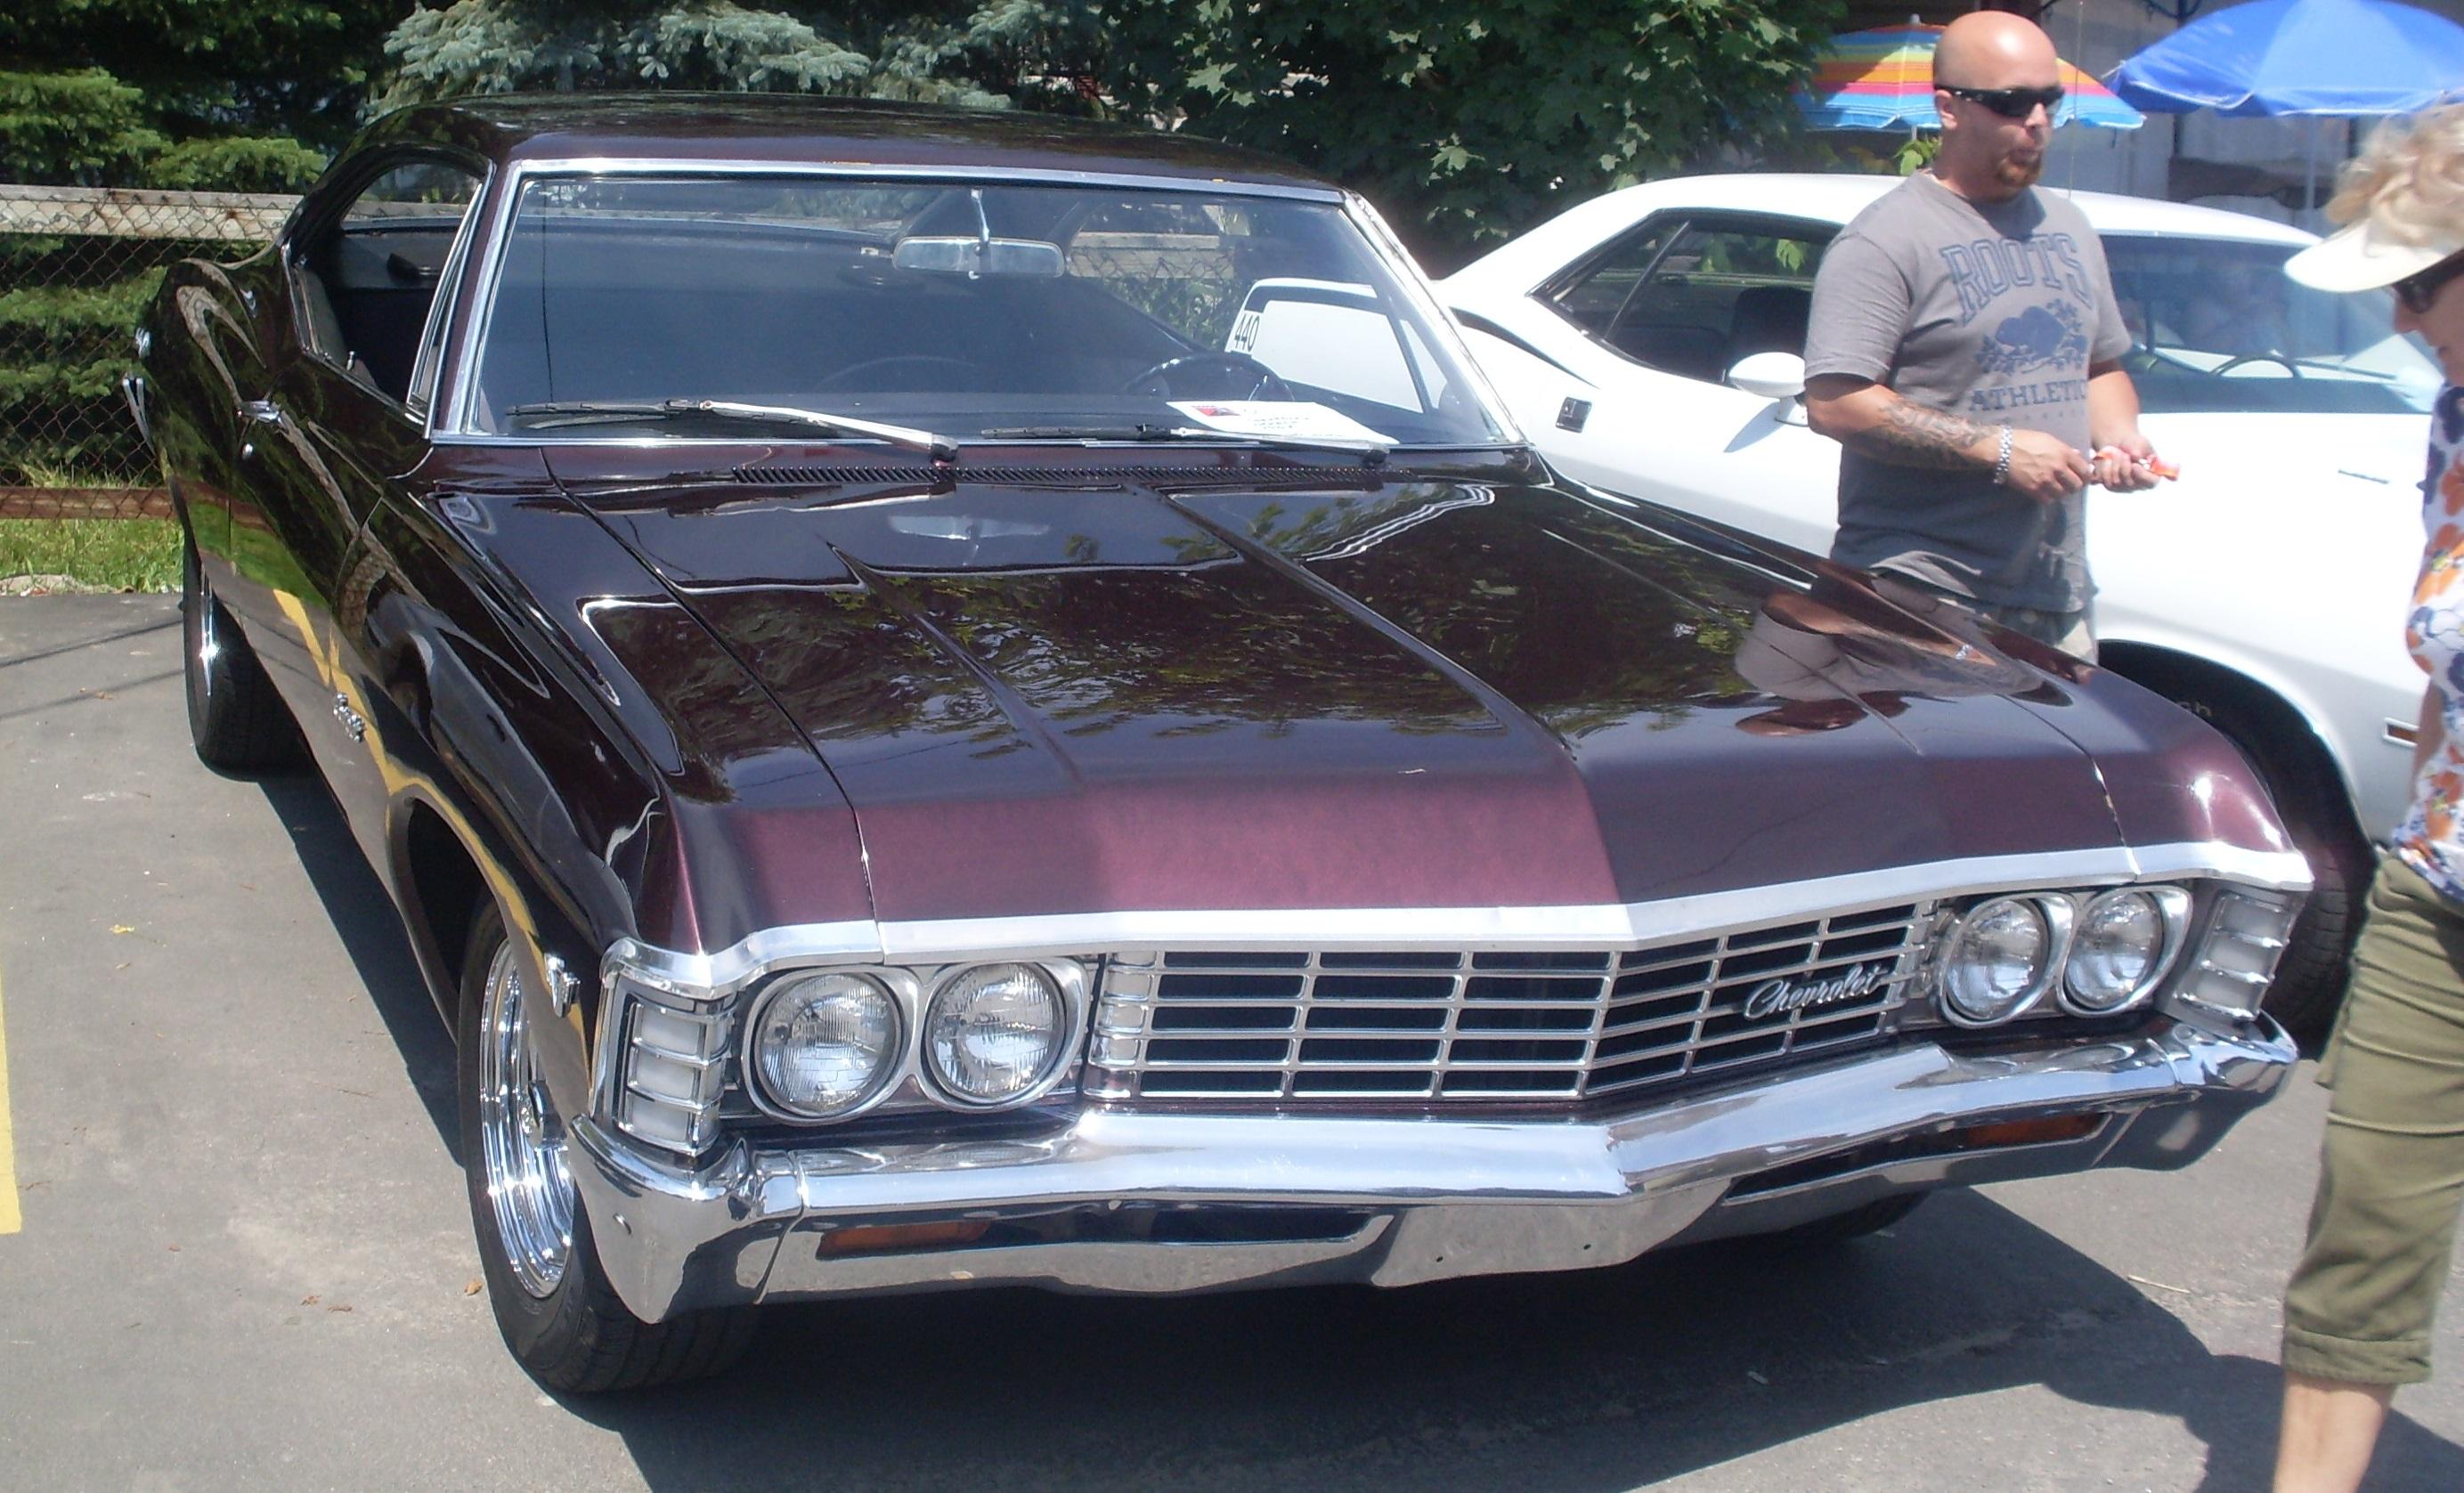 file 39 67 chevrolet impala coupe auto classique hudson 39 13 jpg wikimedia commons. Black Bedroom Furniture Sets. Home Design Ideas